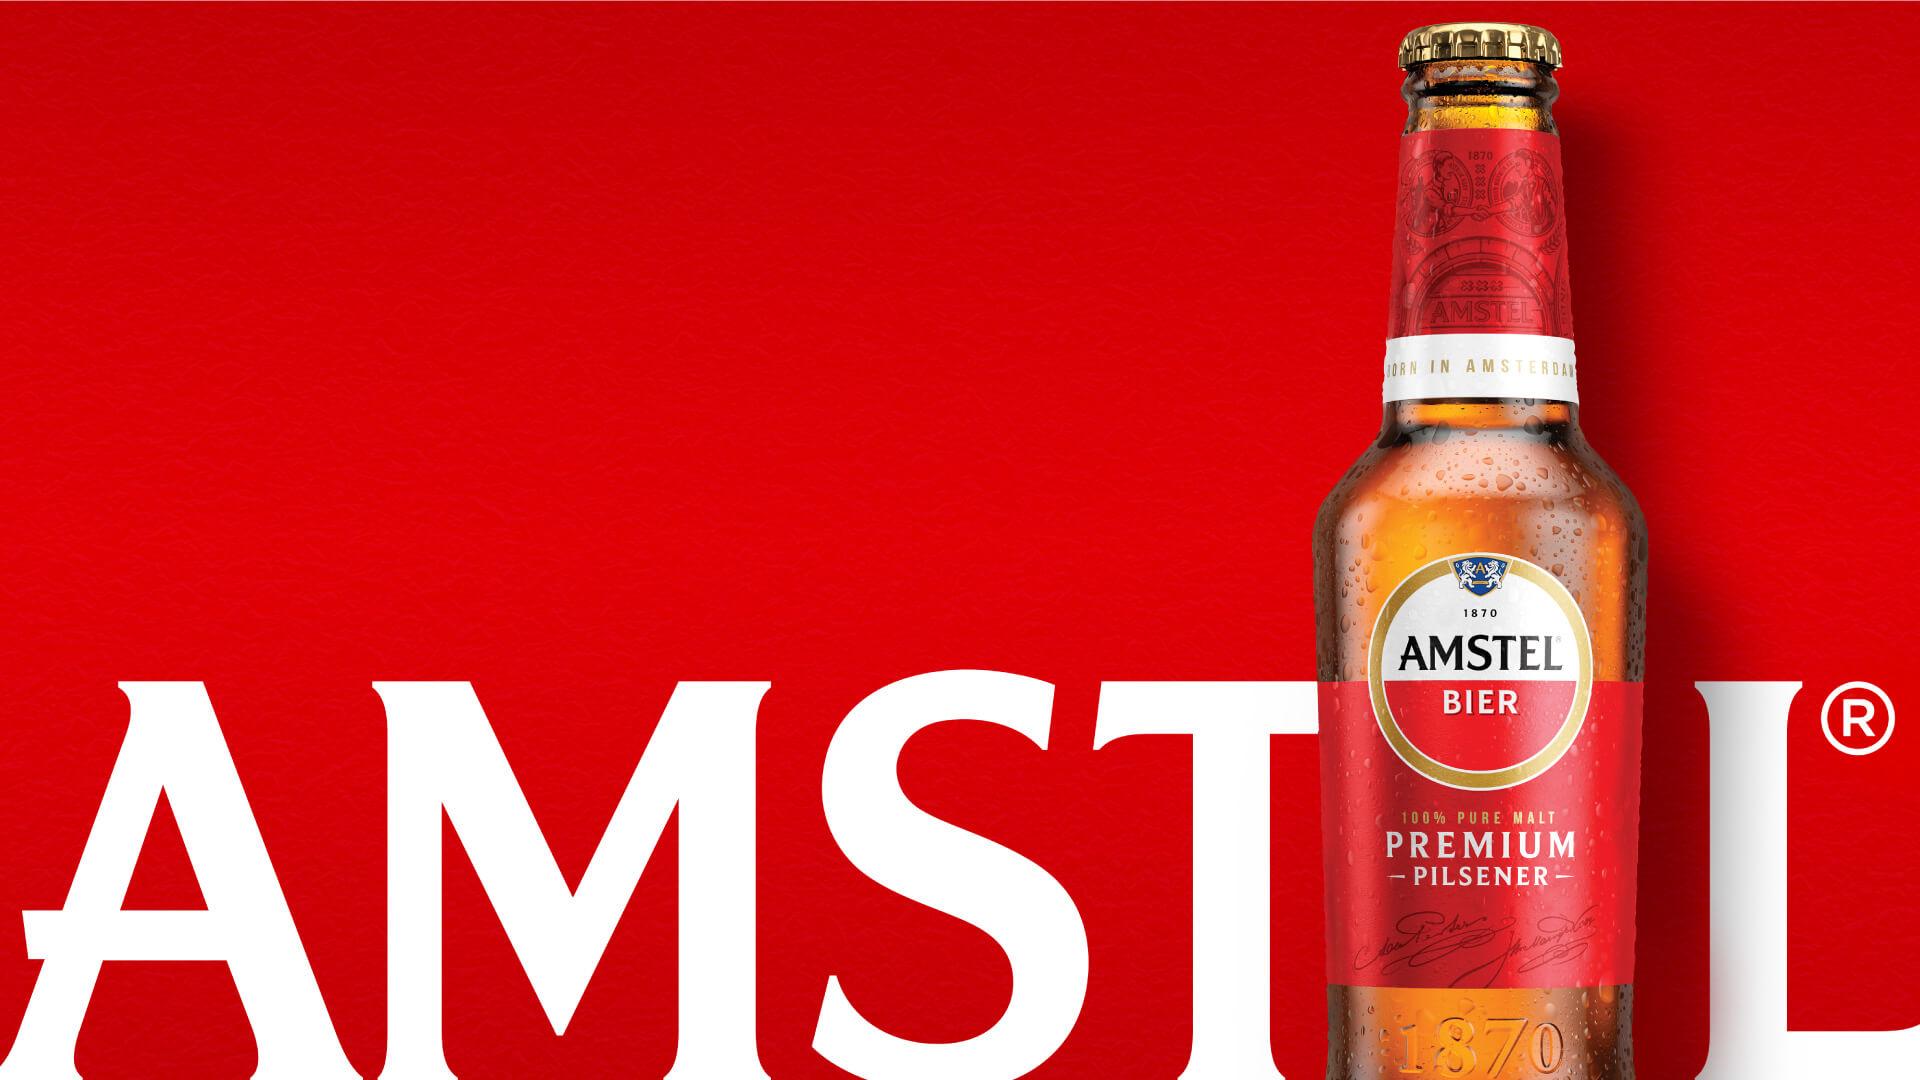 Elmwood London Crafts New Brand Identity for Amstel®